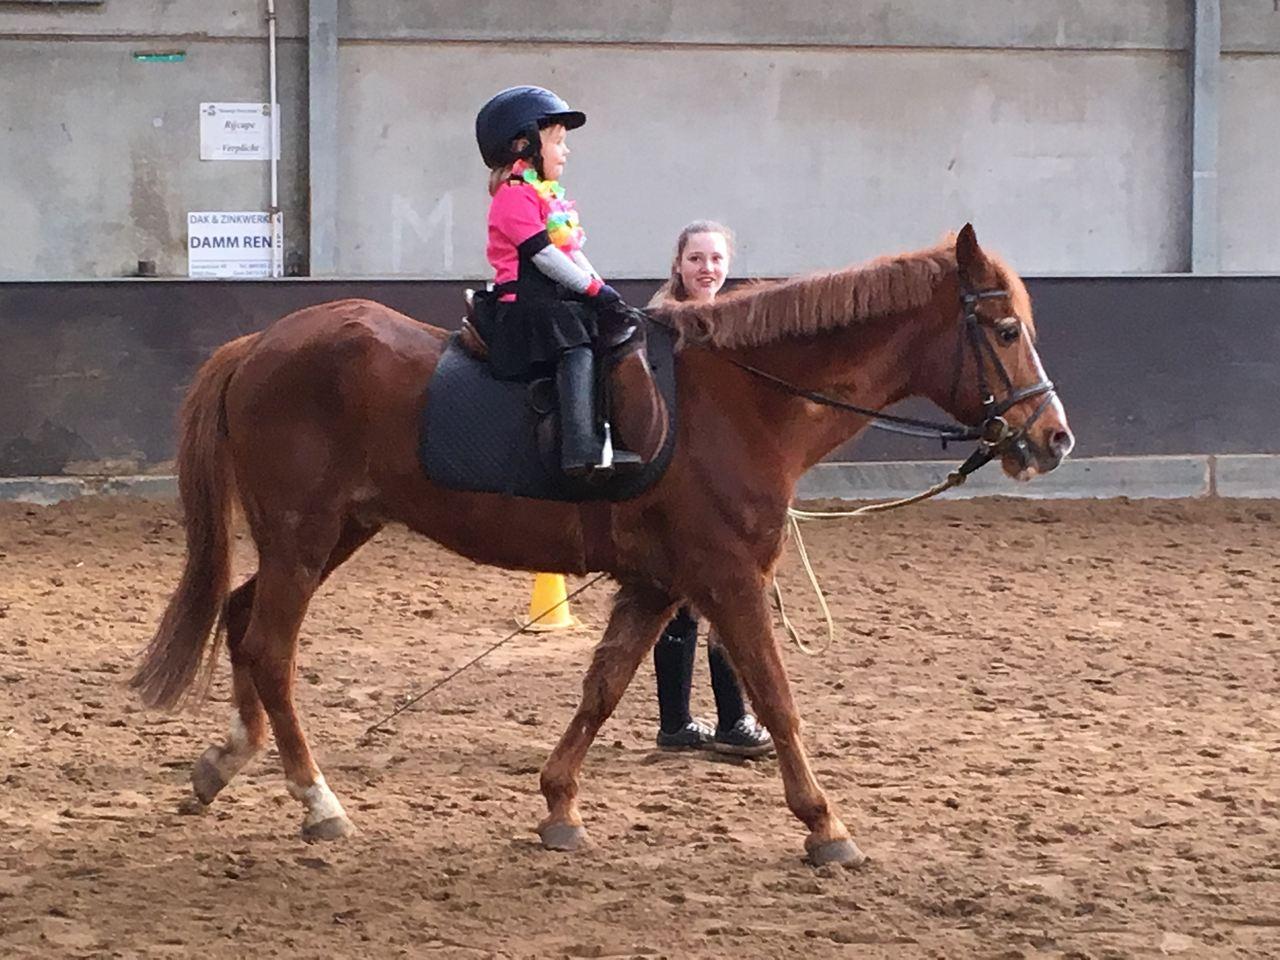 Ponycarnavaldag - 7 maart 2019